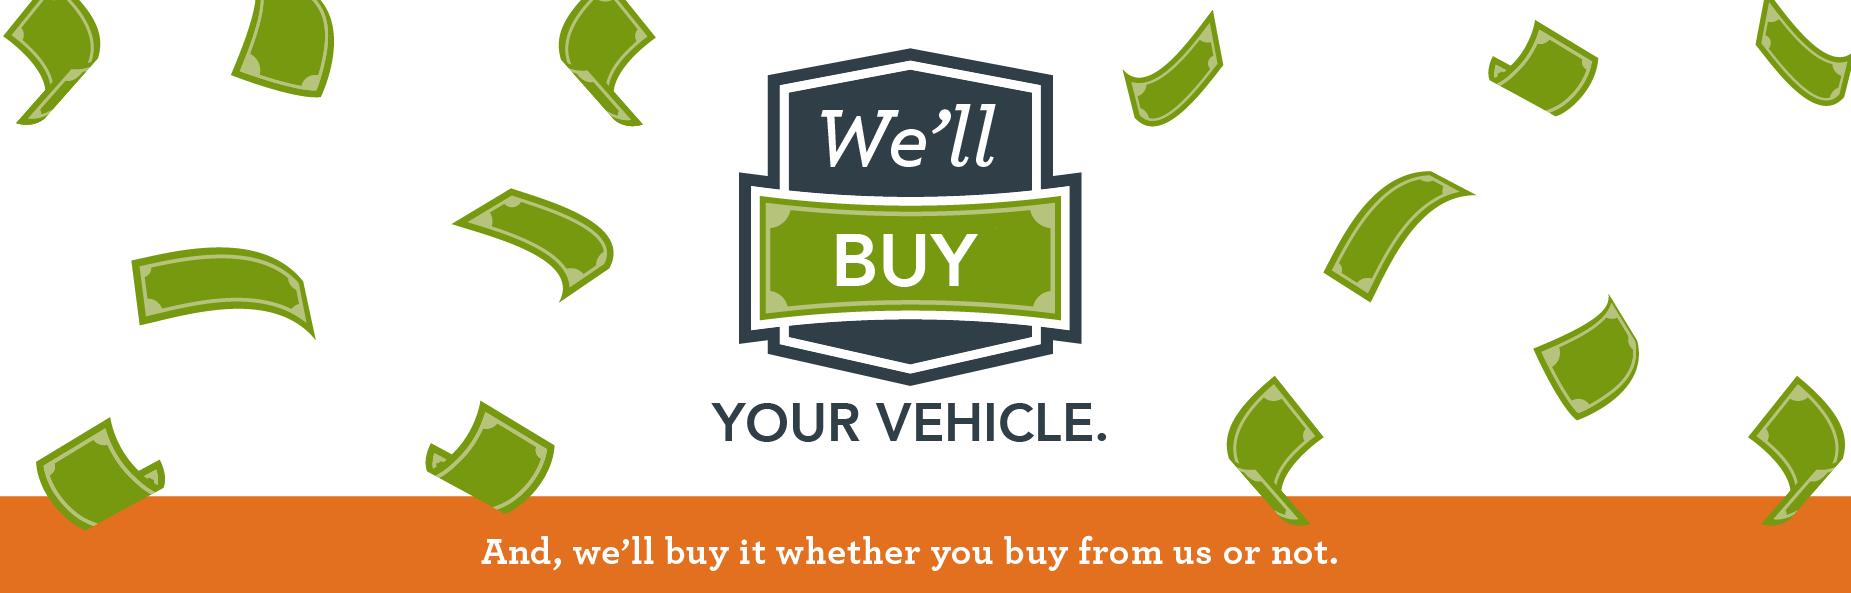 We'll Buy Your Vehicle